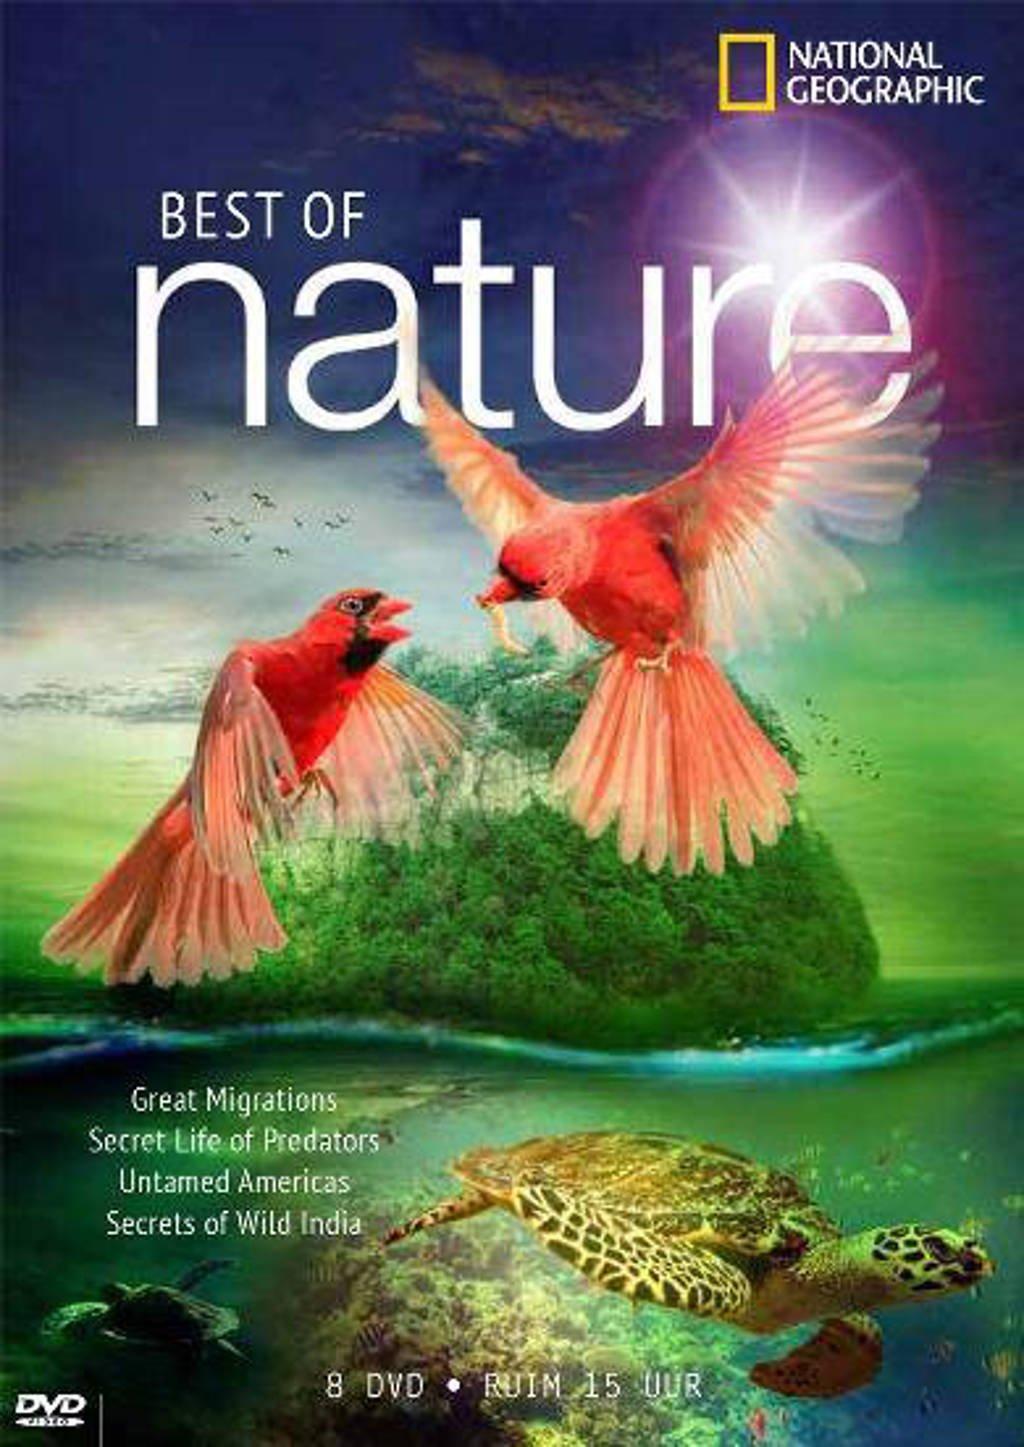 Best of nature box (DVD)